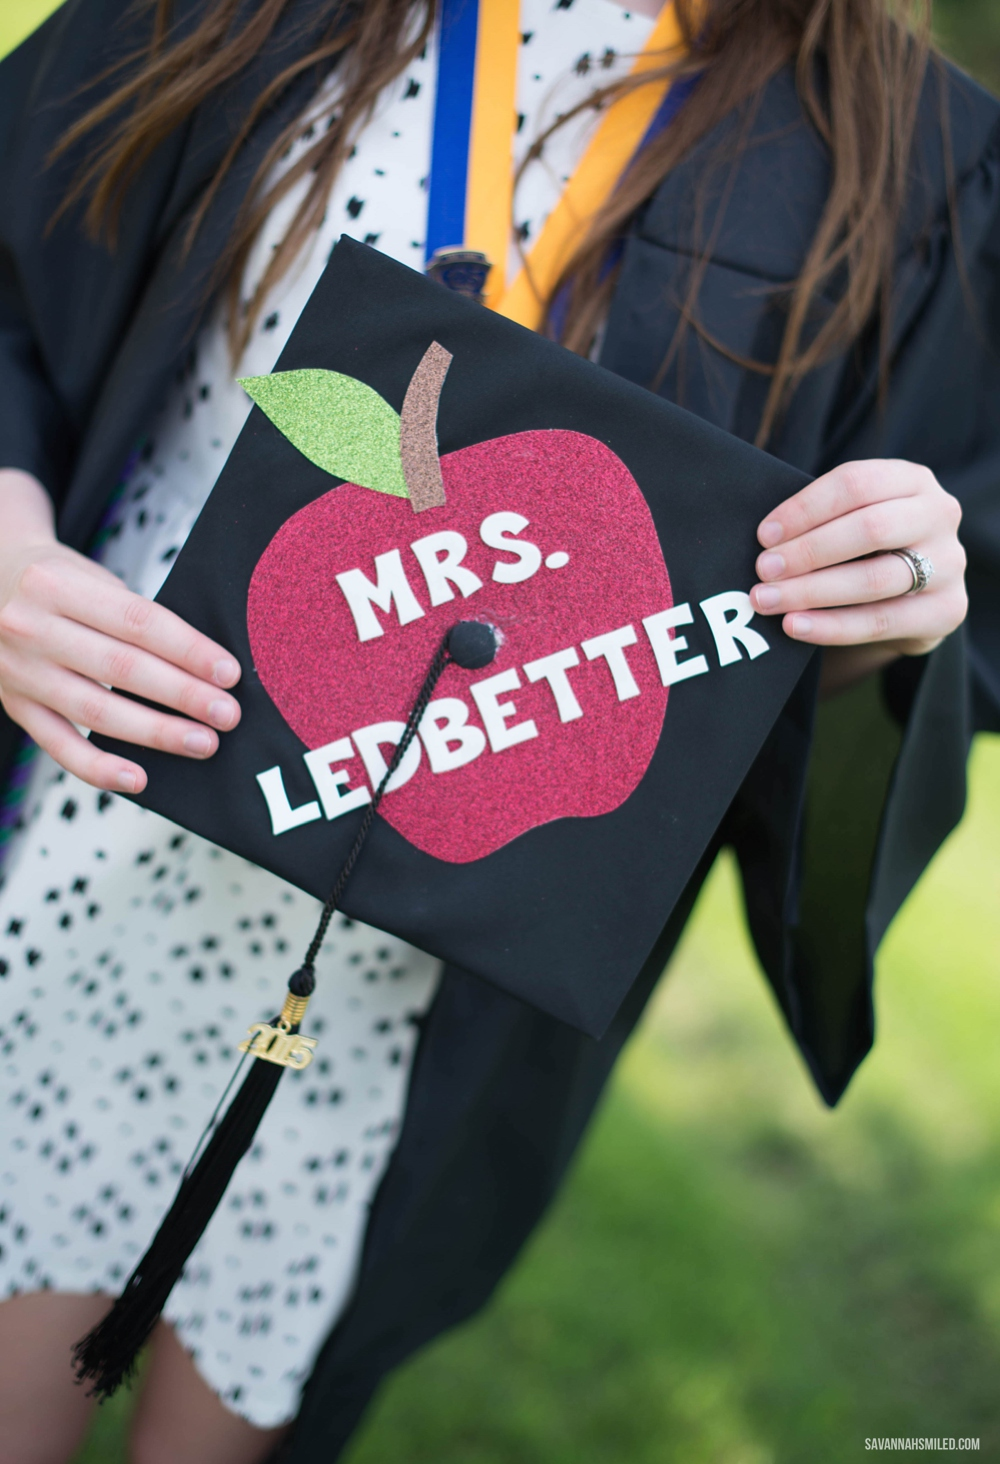 teacher-apple-graduation-cap.jpg